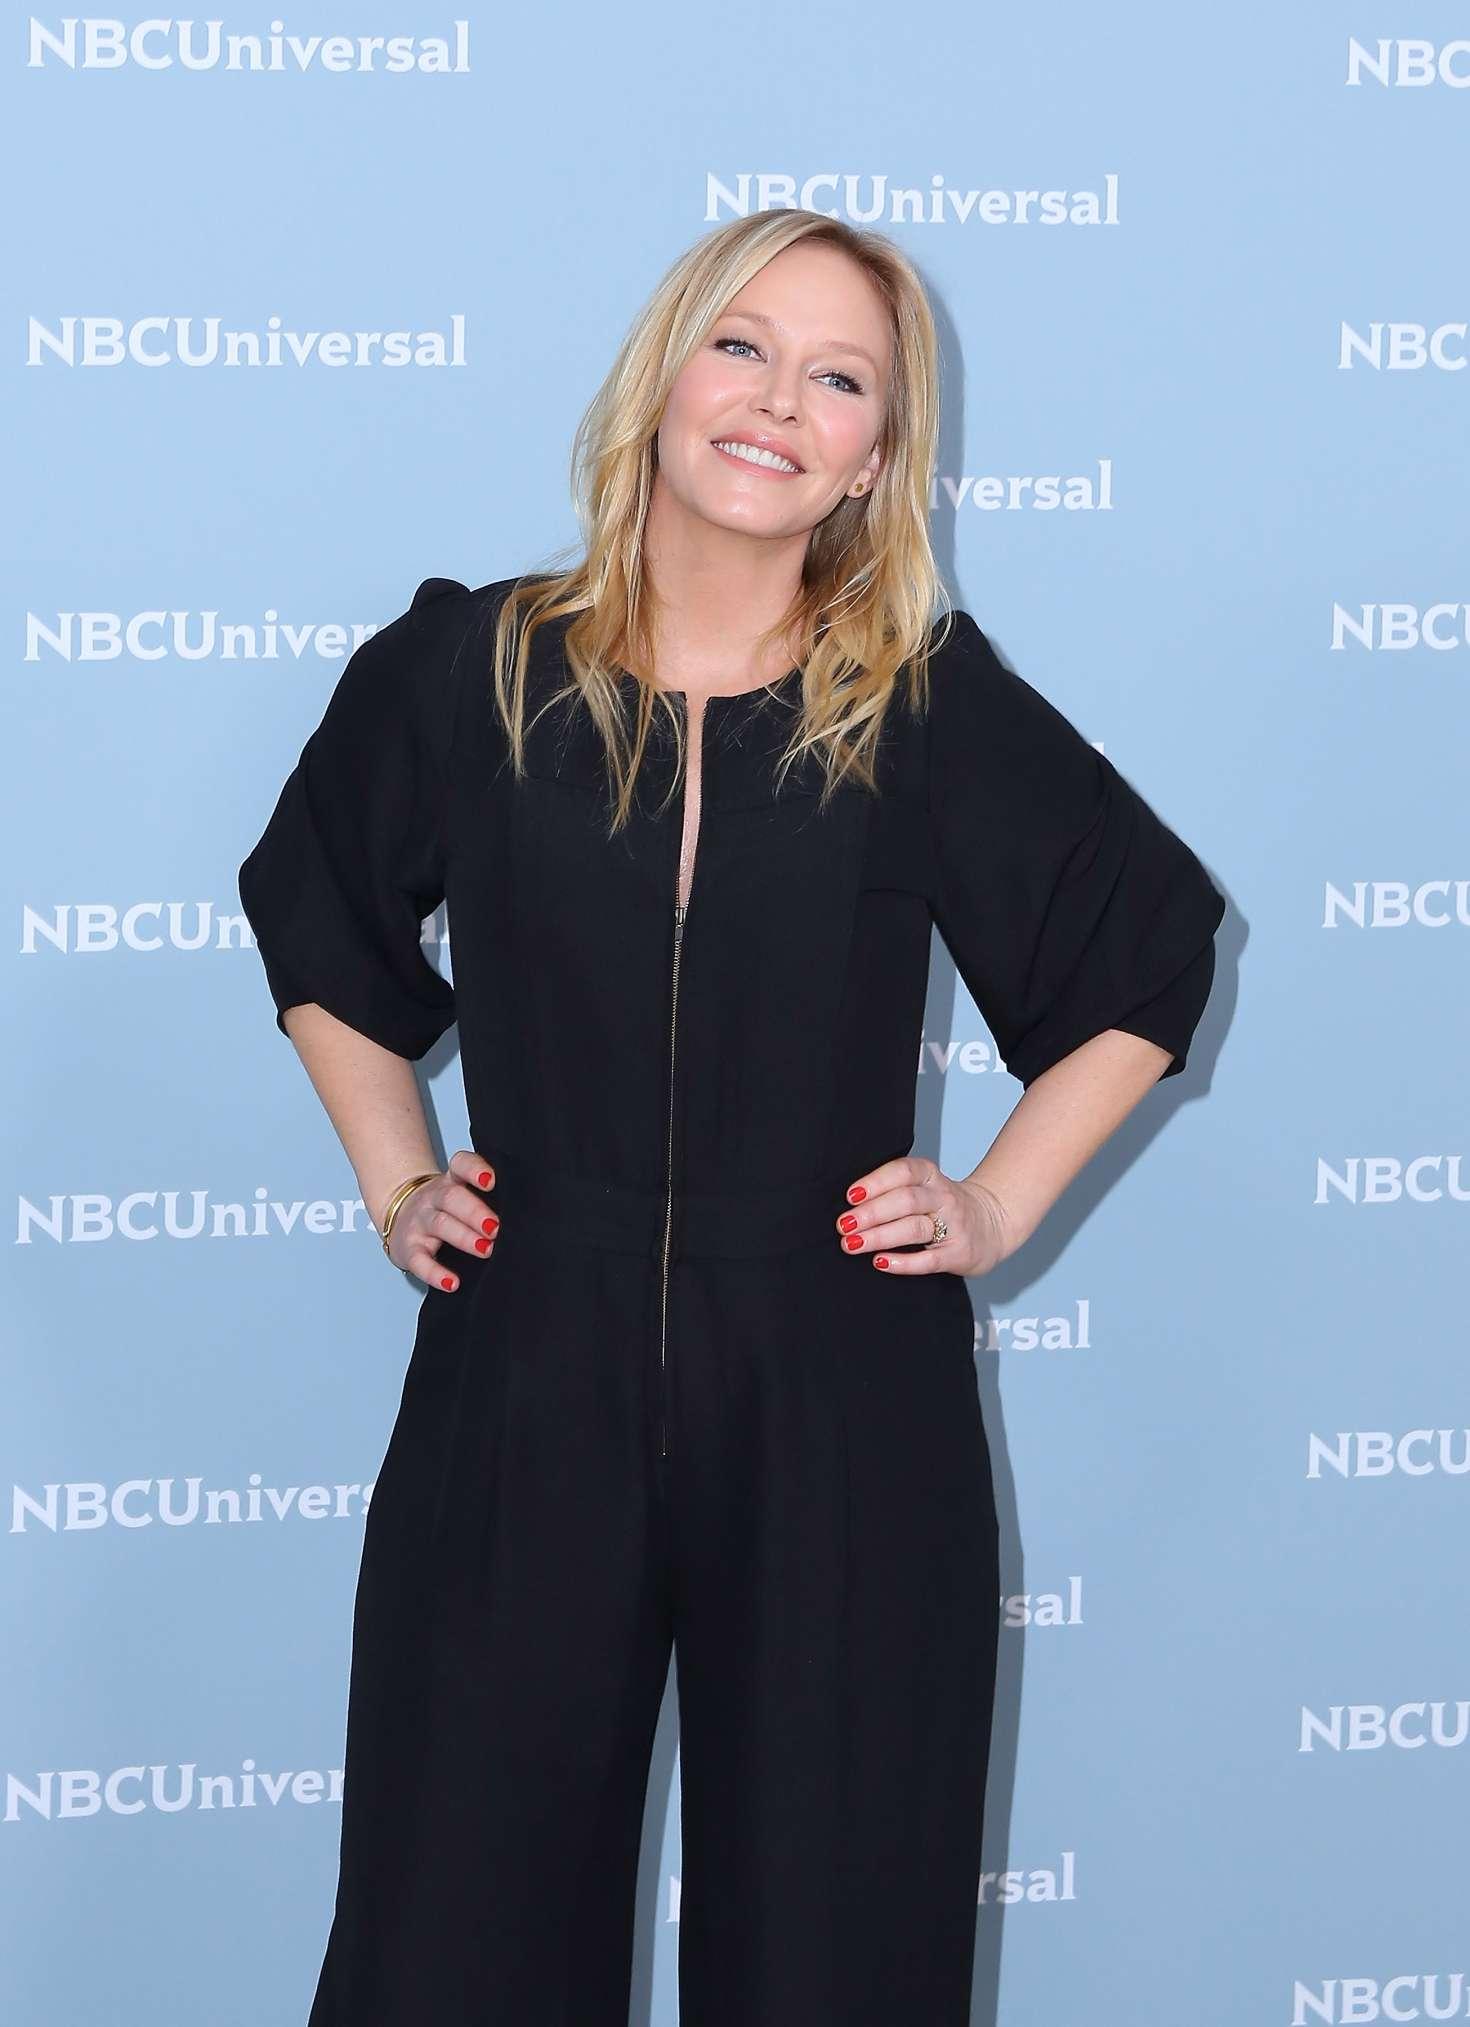 Kelli Giddish 2018 : Kelli Giddish: 2018 NBCUniversal Upfront Presentation -05